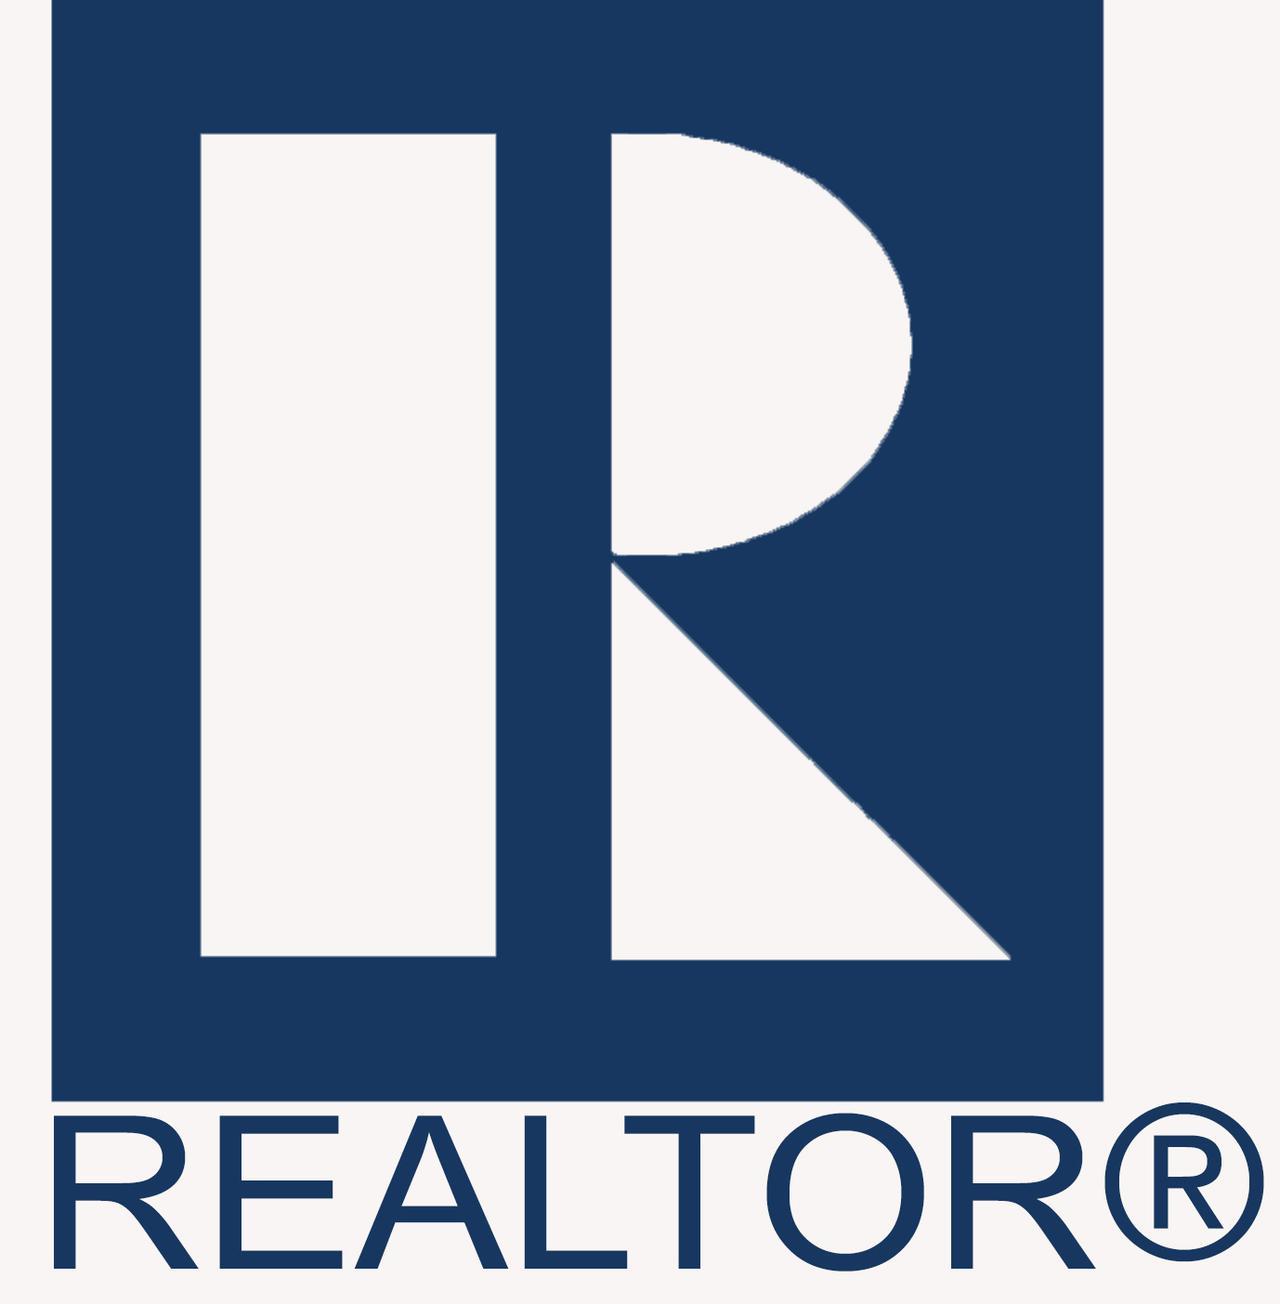 Realtor-R-Cap.Dk-Blue-reversed.jpg